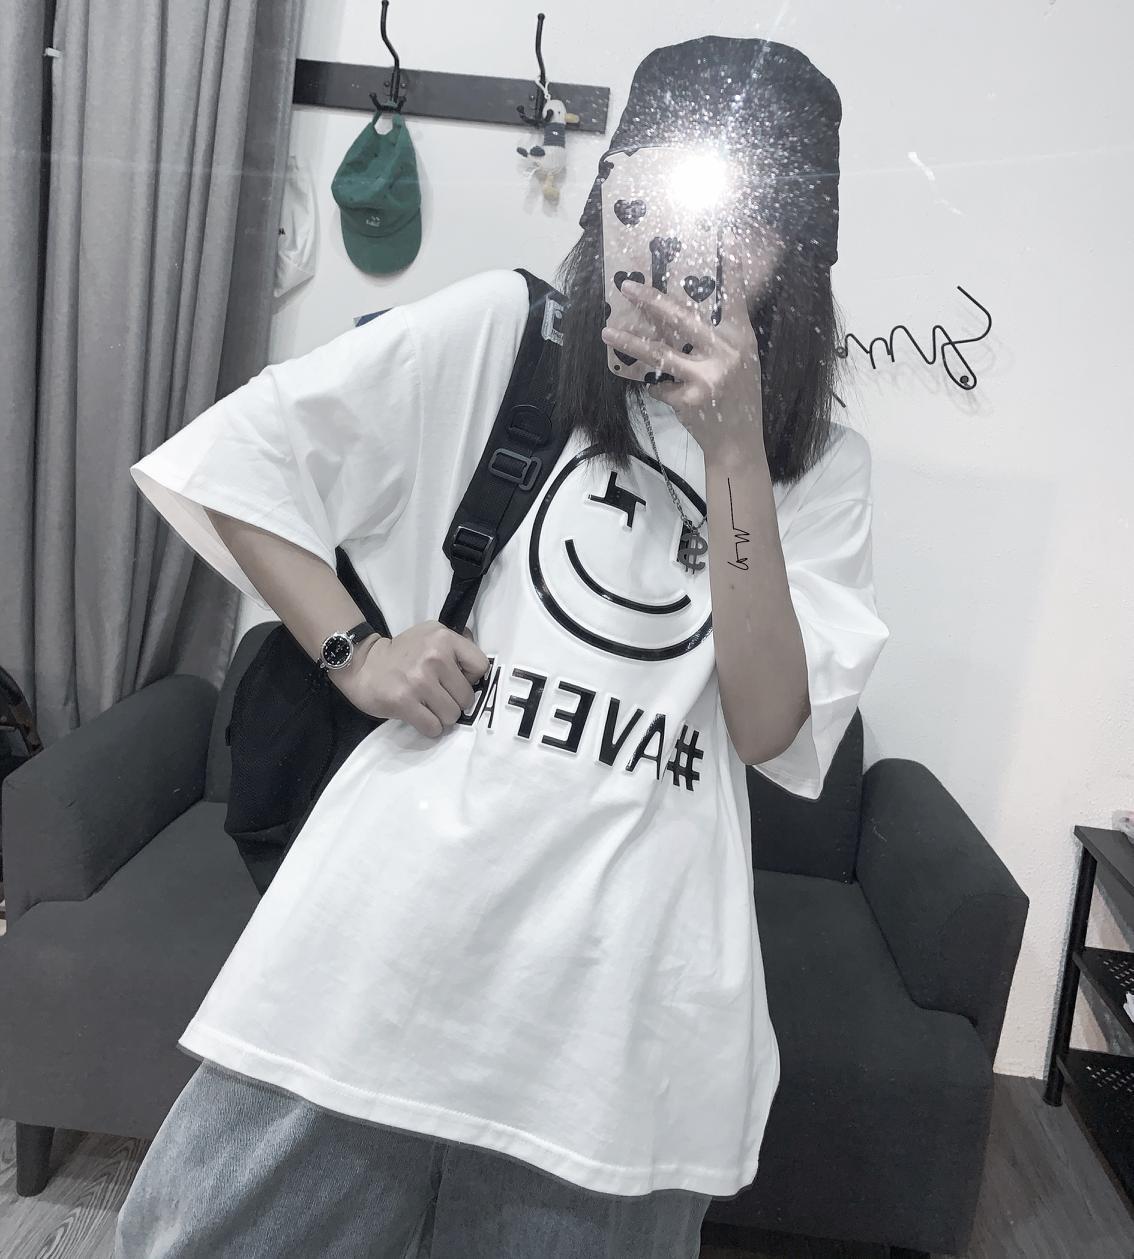 Short Sleeve White Ins T-shirt Spring Autumn Men Women  Korean Style trend print Smiley Casual Clothing Loose Street Style 2021